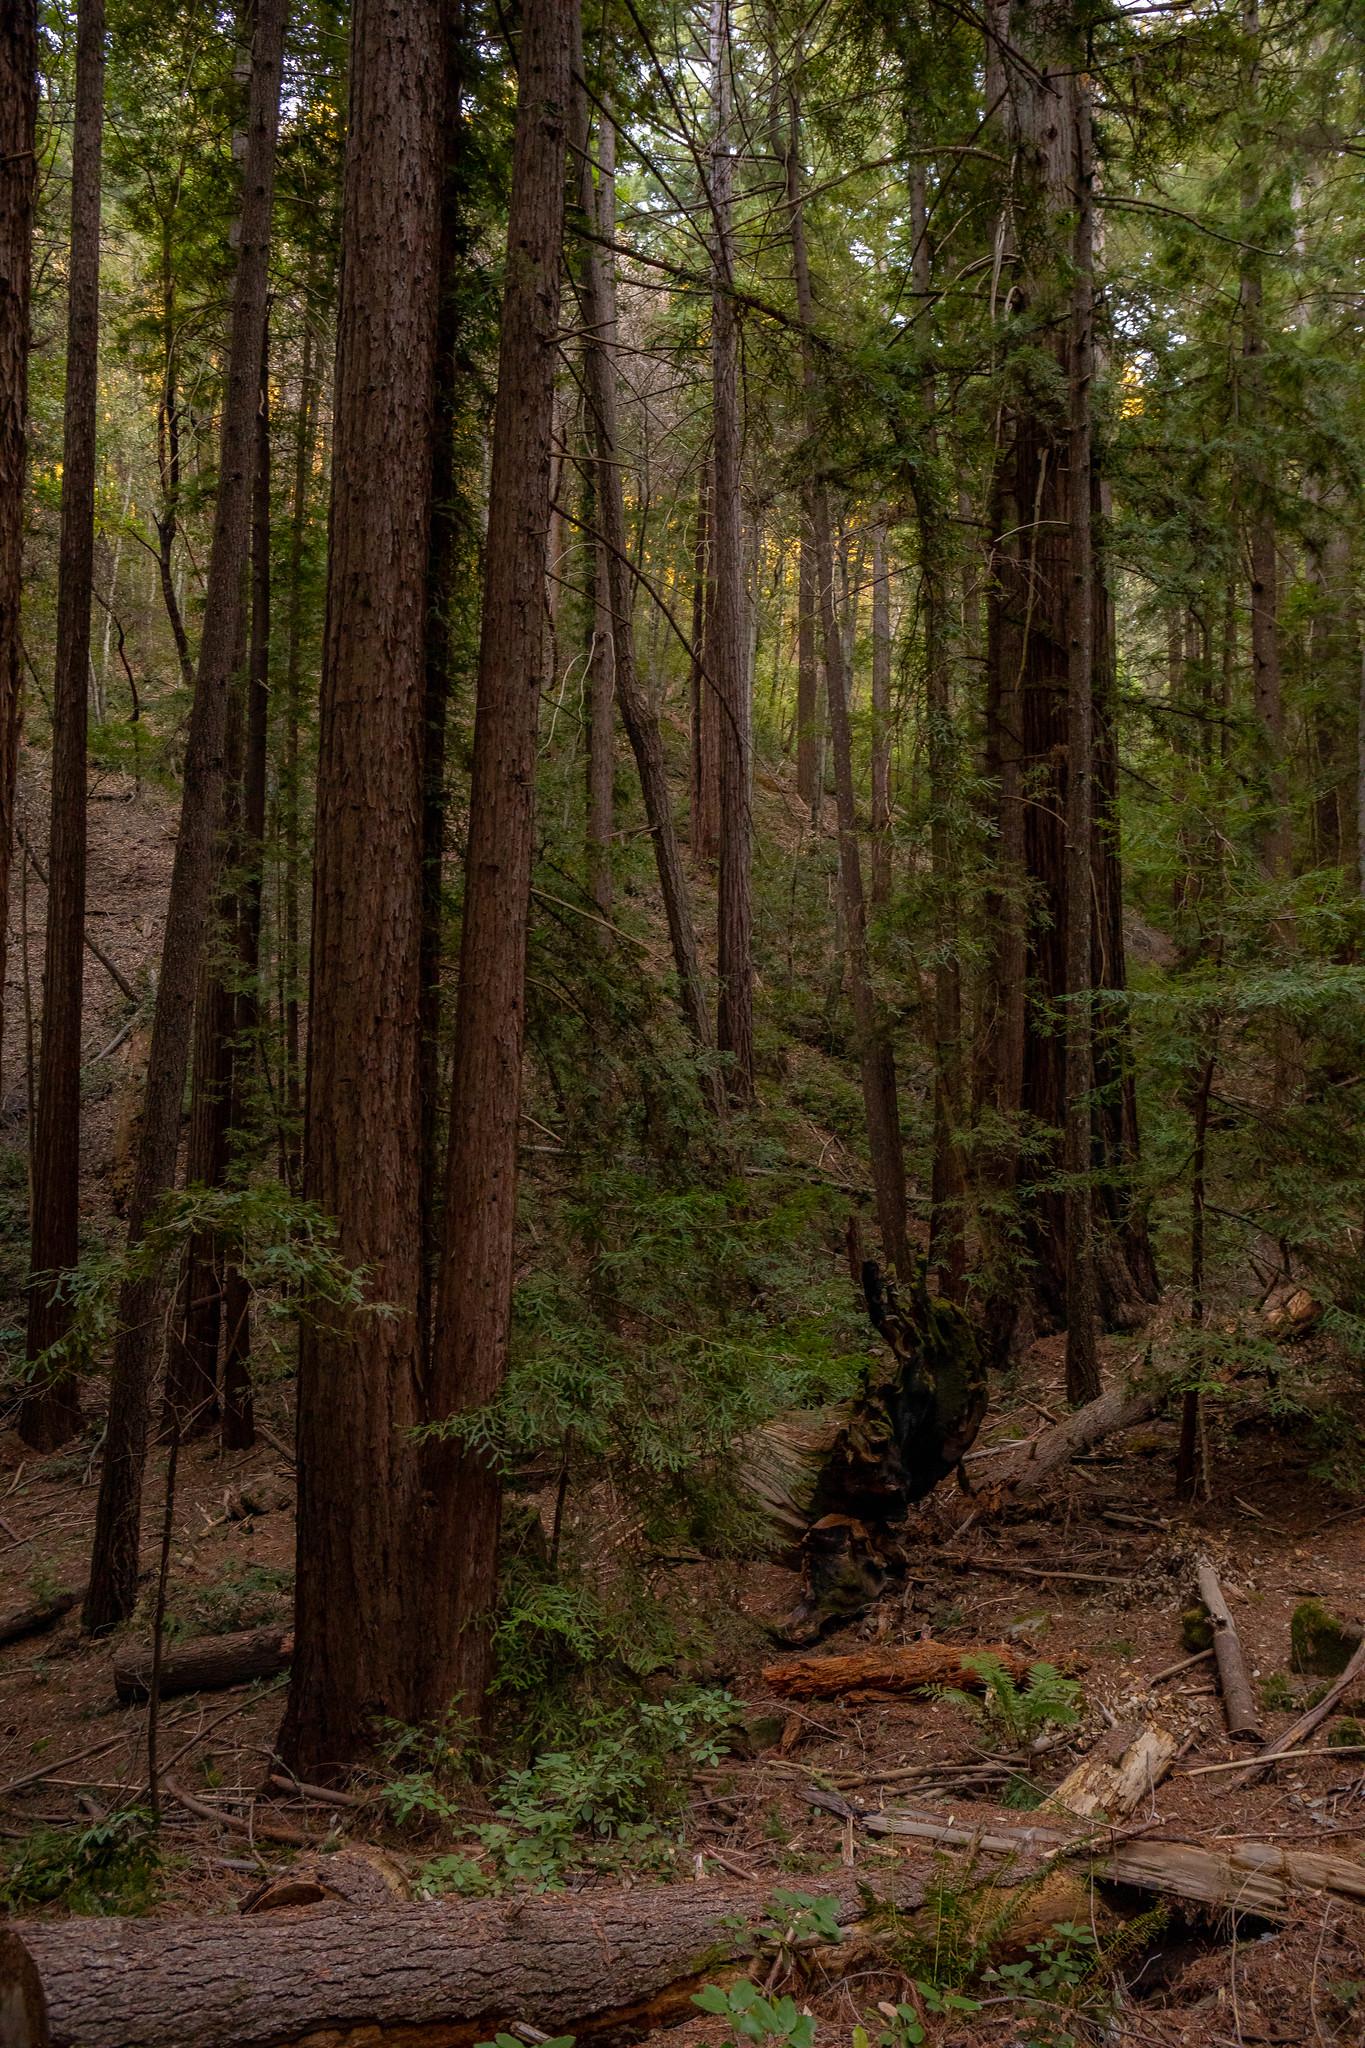 02.09. Sanborn County Park